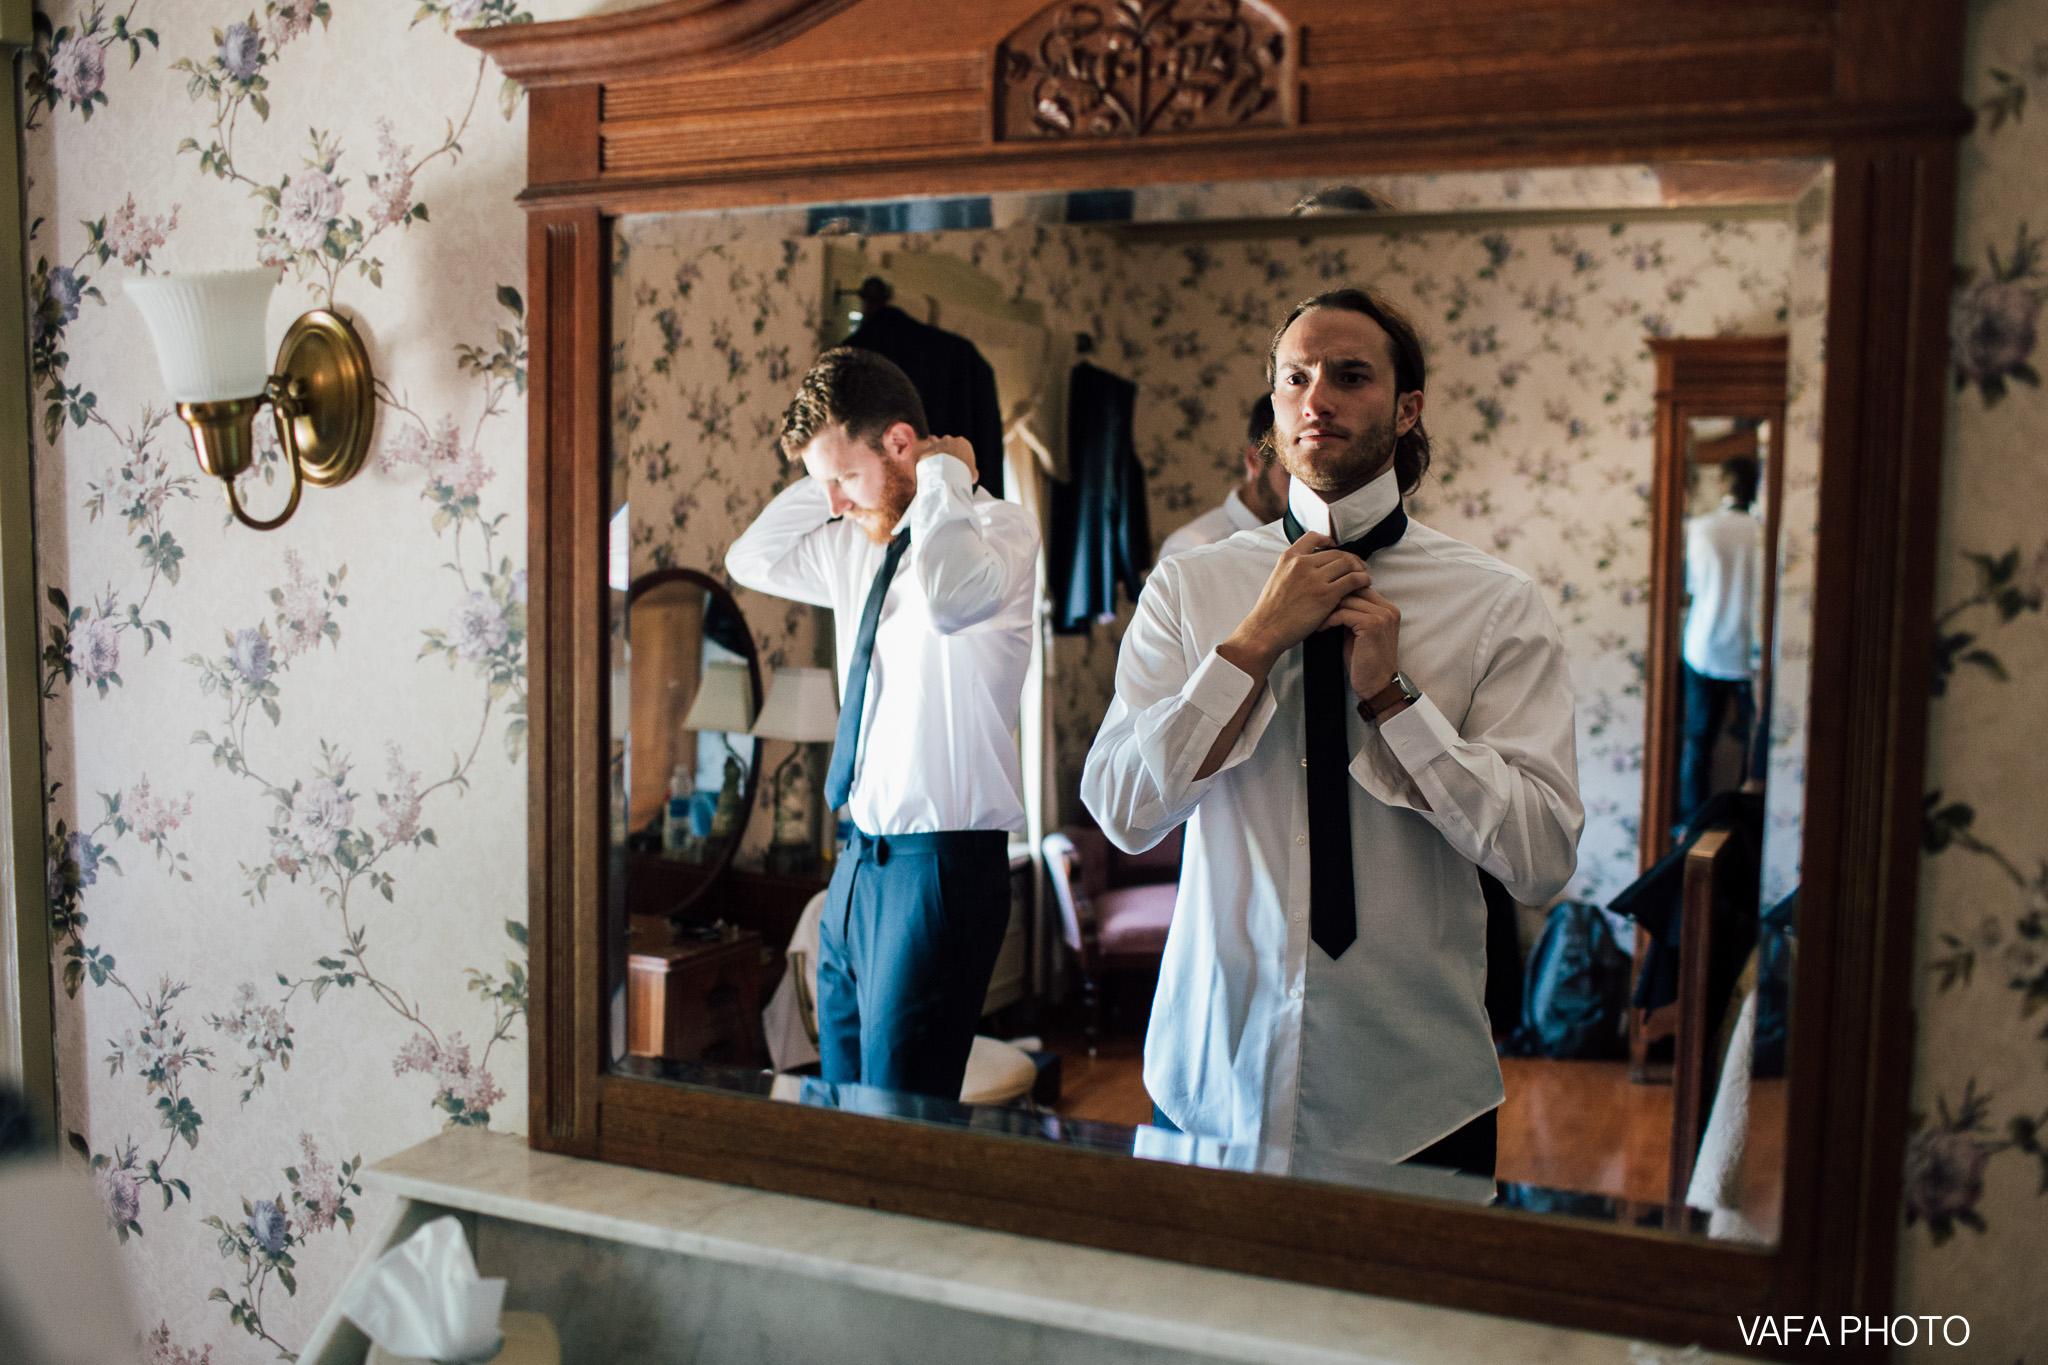 The-Felt-Estate-Wedding-Kailie-David-Vafa-Photo-49.jpg